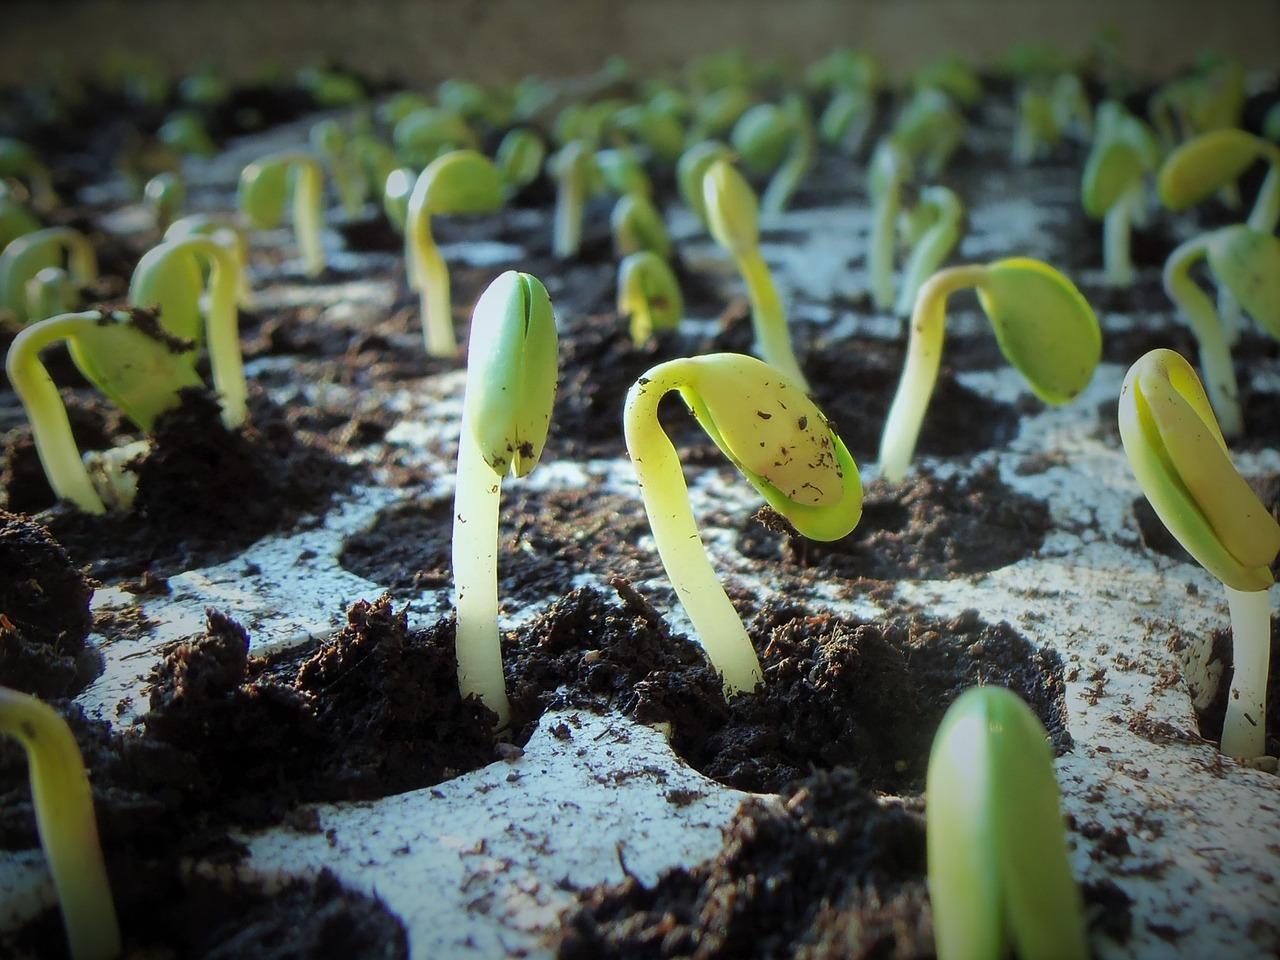 plants-1331667_1280